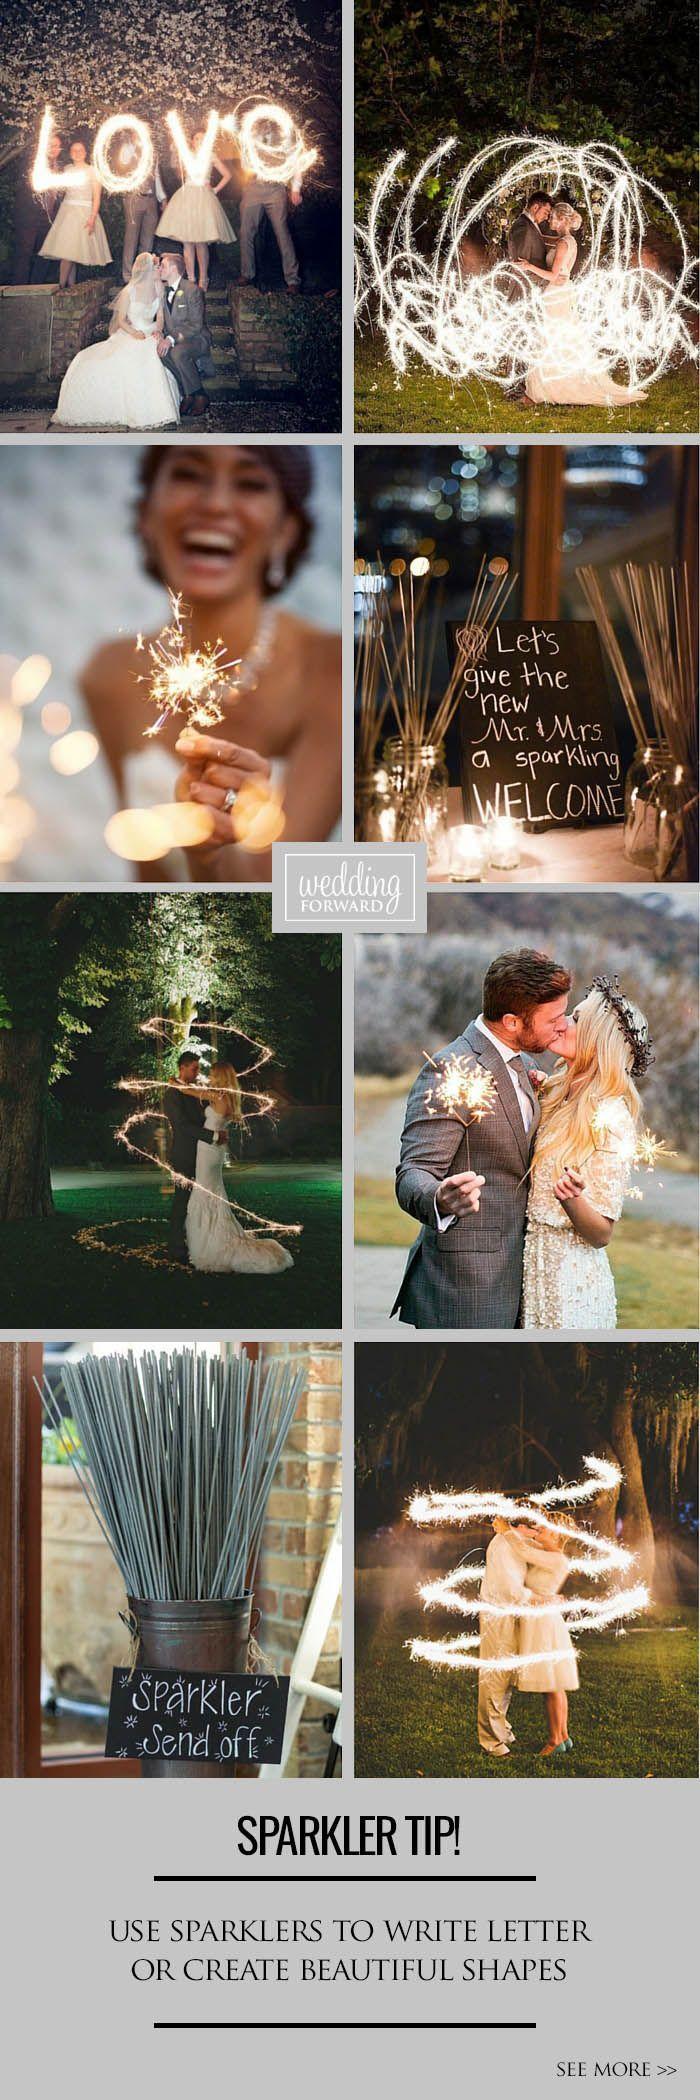 wedding send off ideas 3 Sparkler Photo Ideas Tips Keep reading for tips for perfect wedding sparker photos